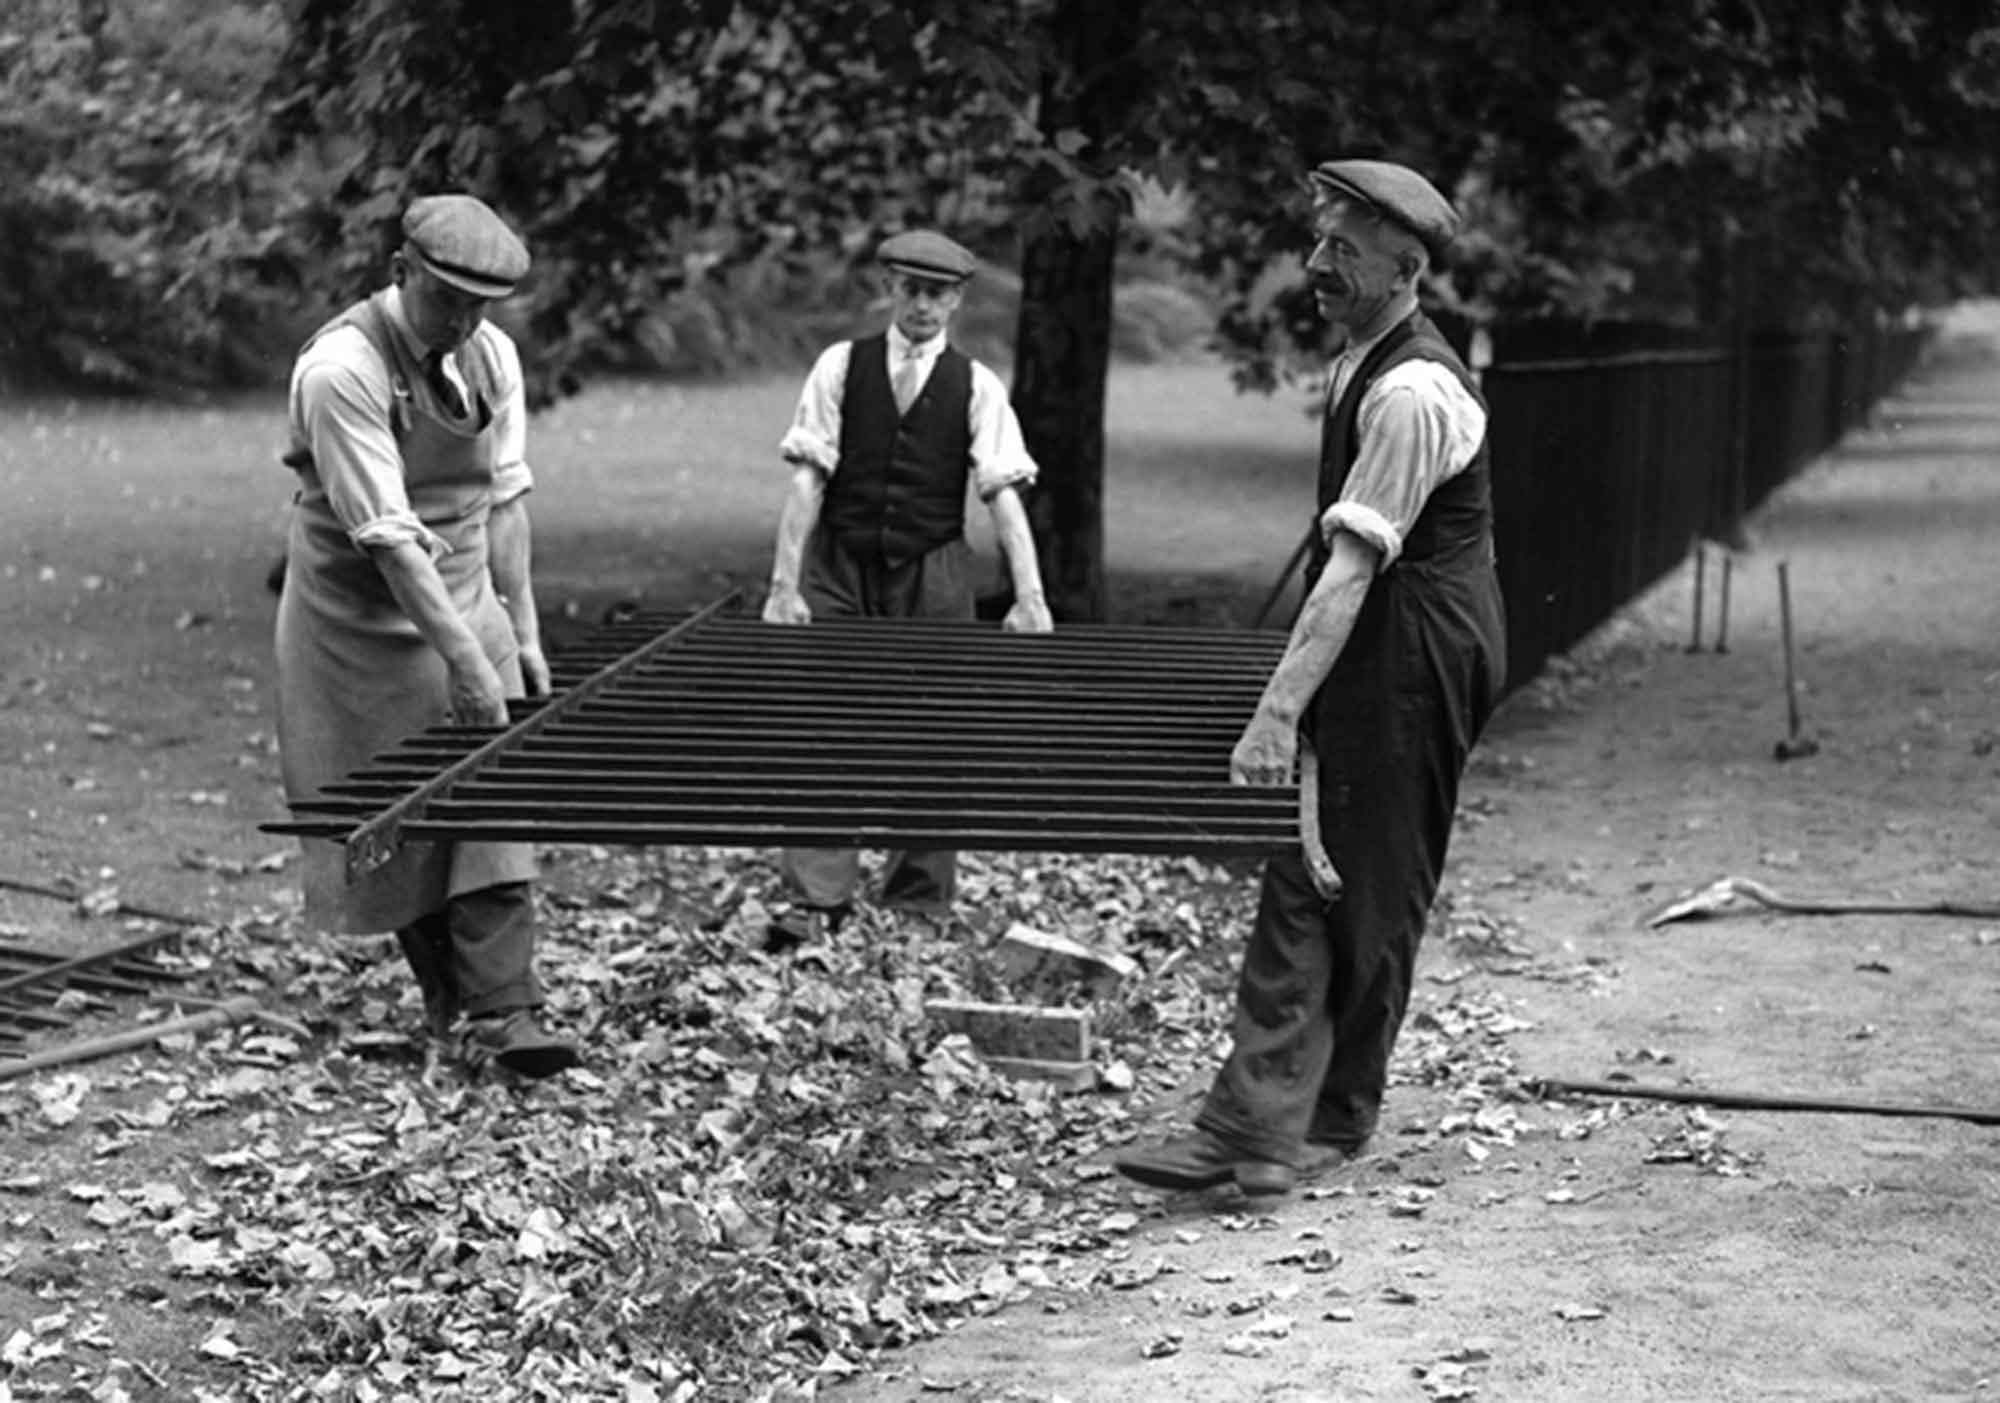 6 (Workmen railings)